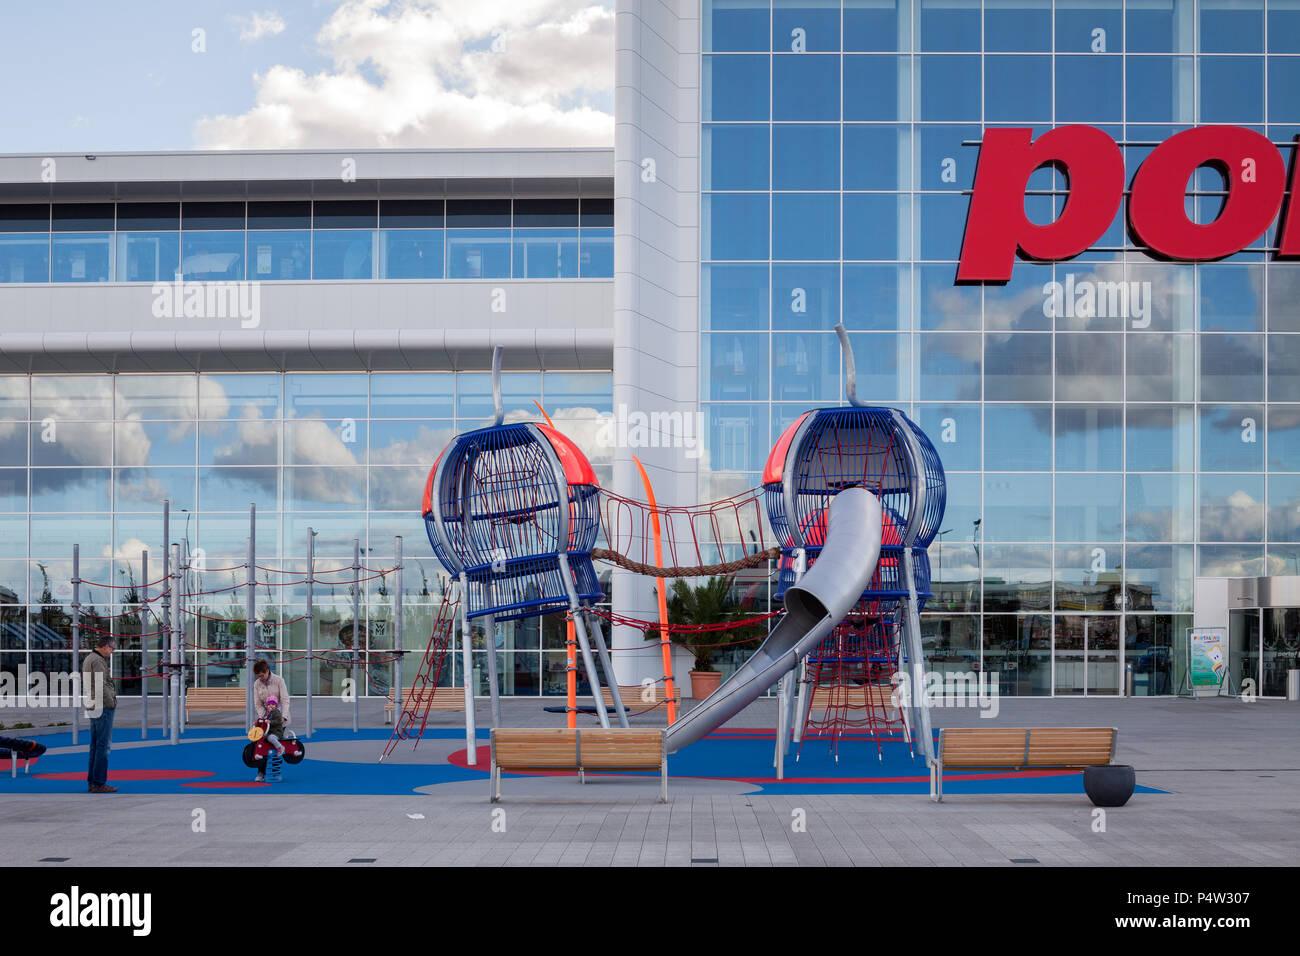 Berlin Deutschland Spielplatz Vor Der Porta Moebelgeschaeft Auf